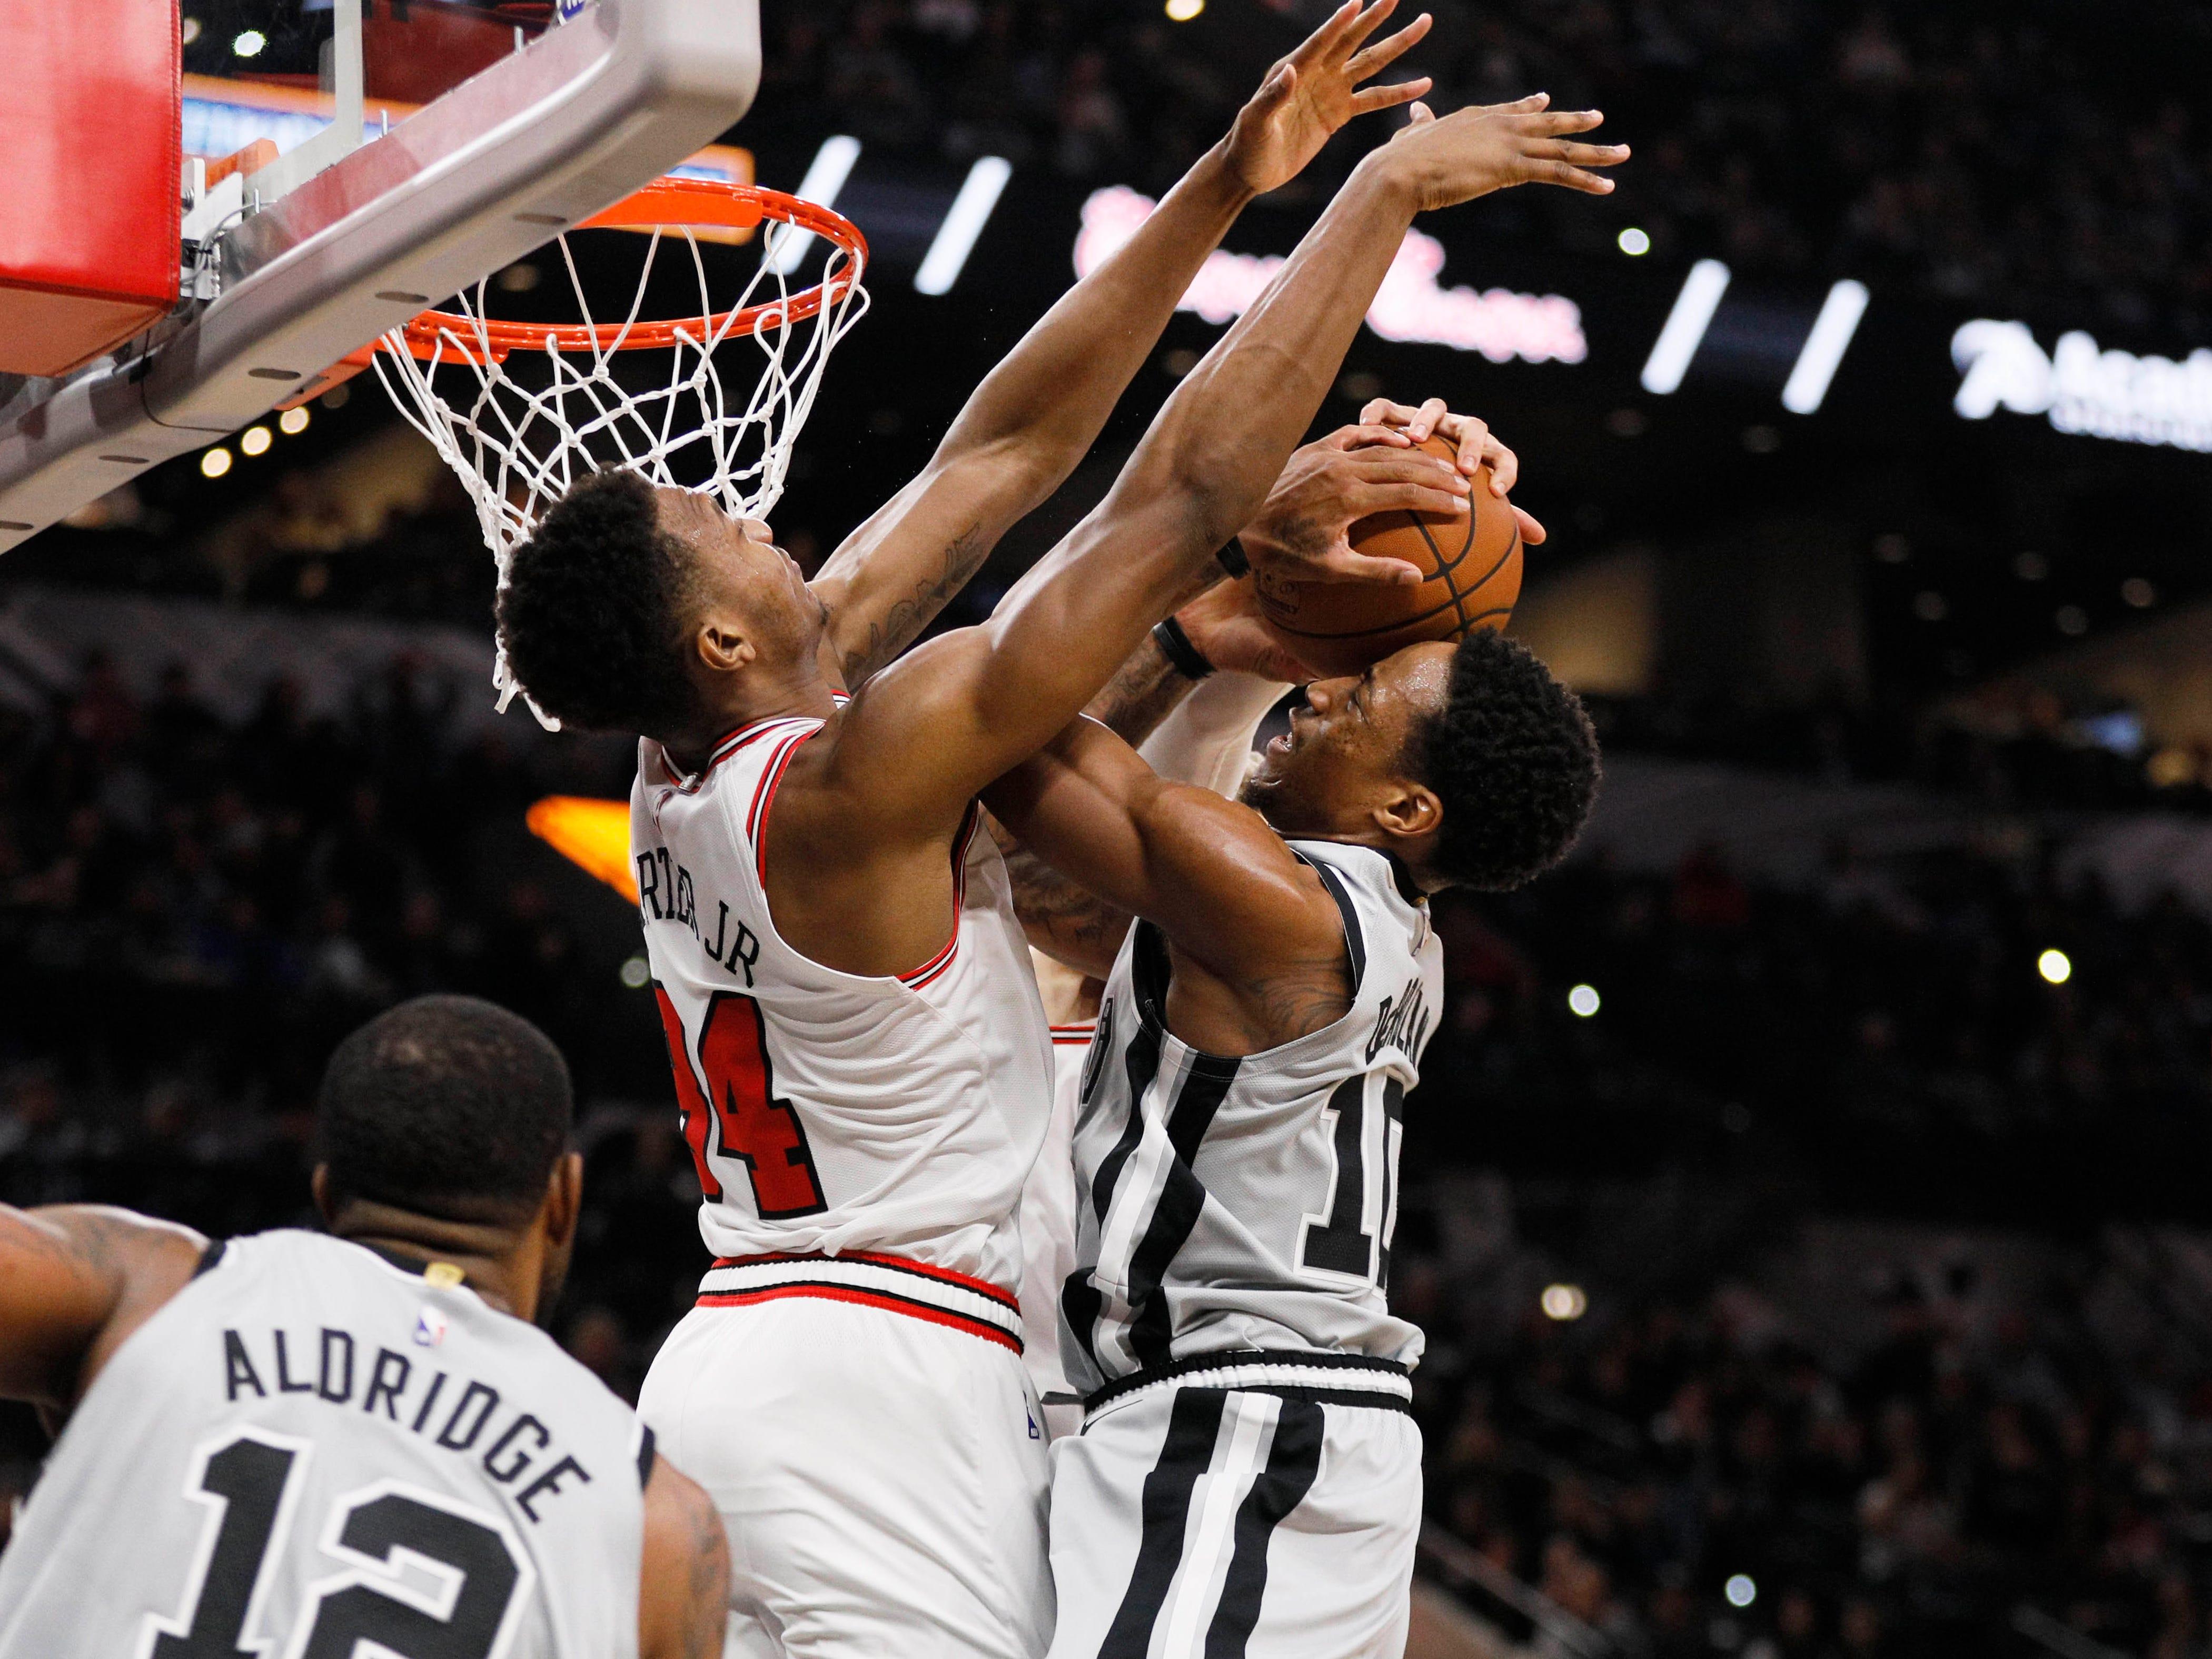 Dec. 15: Bulls defender Wendell Carter Jr. (34) meets Spurs guard DeMar DeRozan (10) at the rim during the second half in San Antonio.